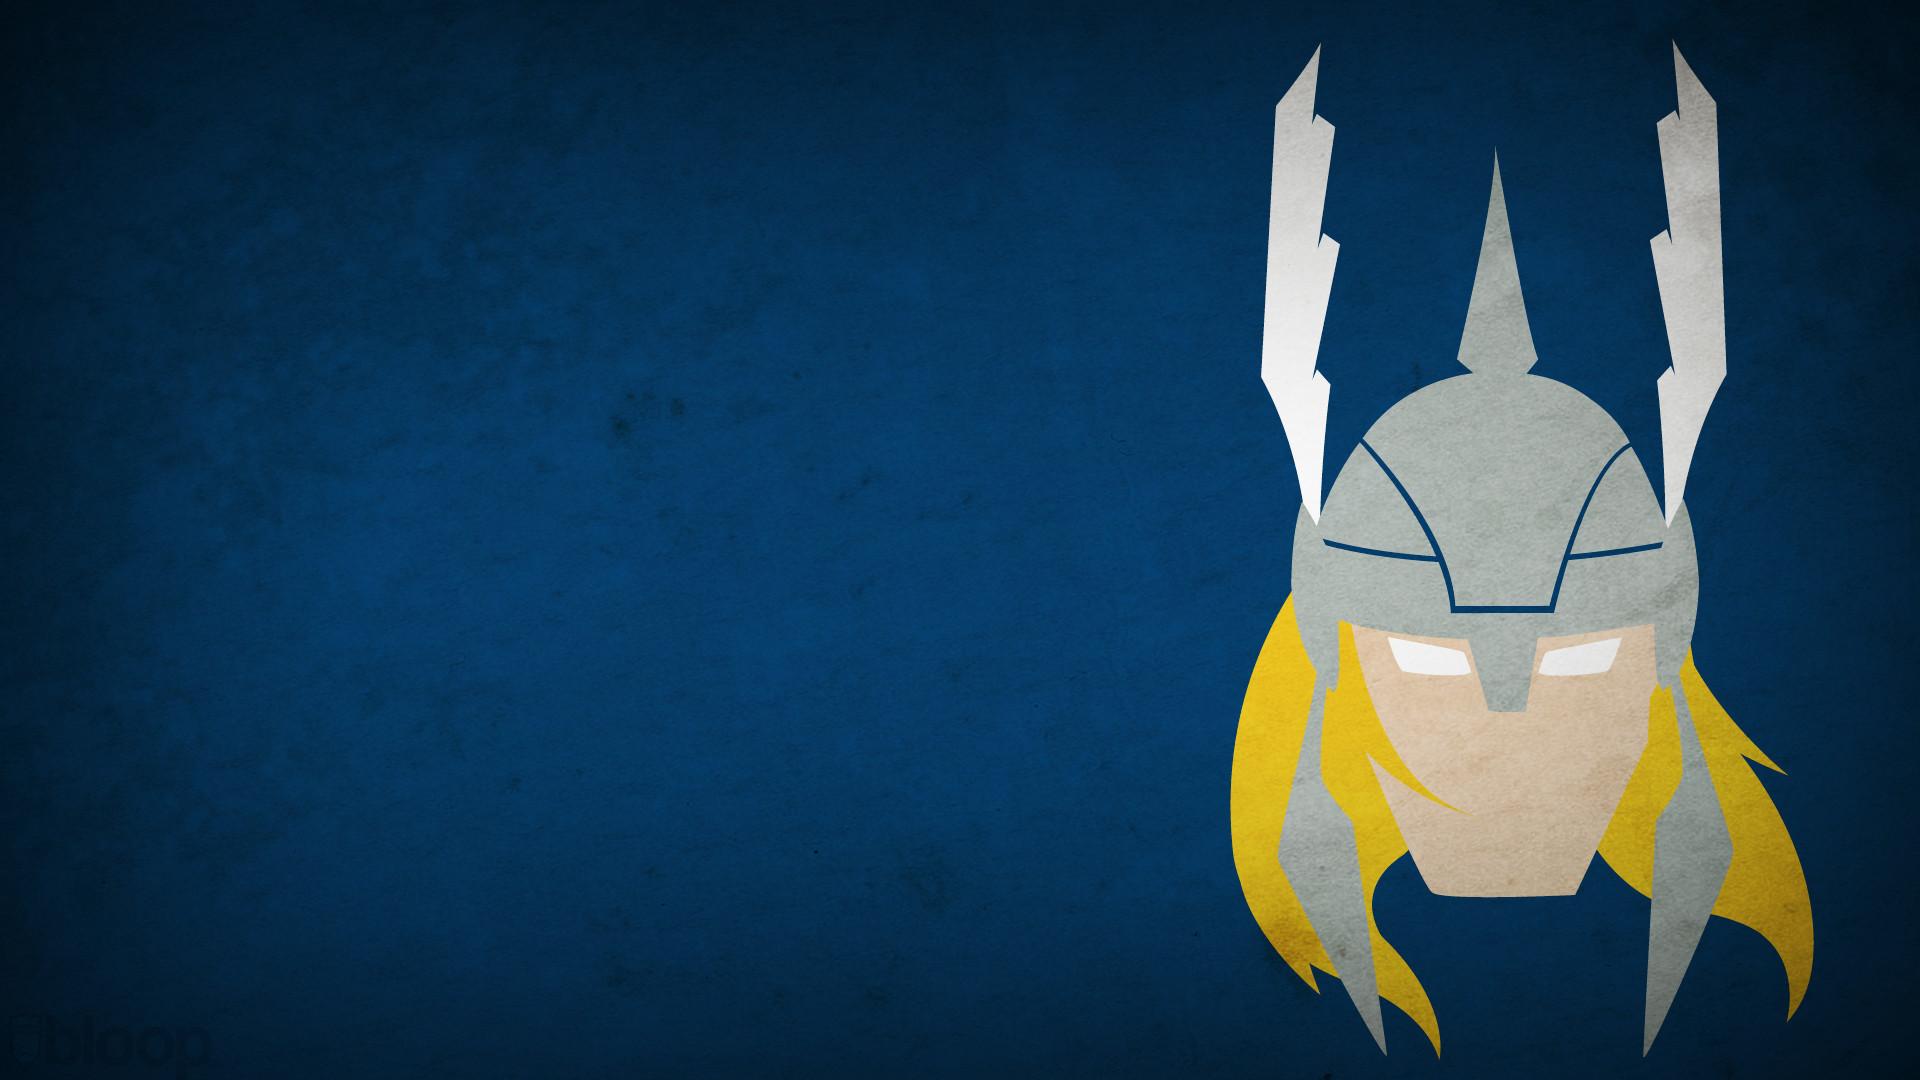 HD Superhero Wallpapers (72+ Images